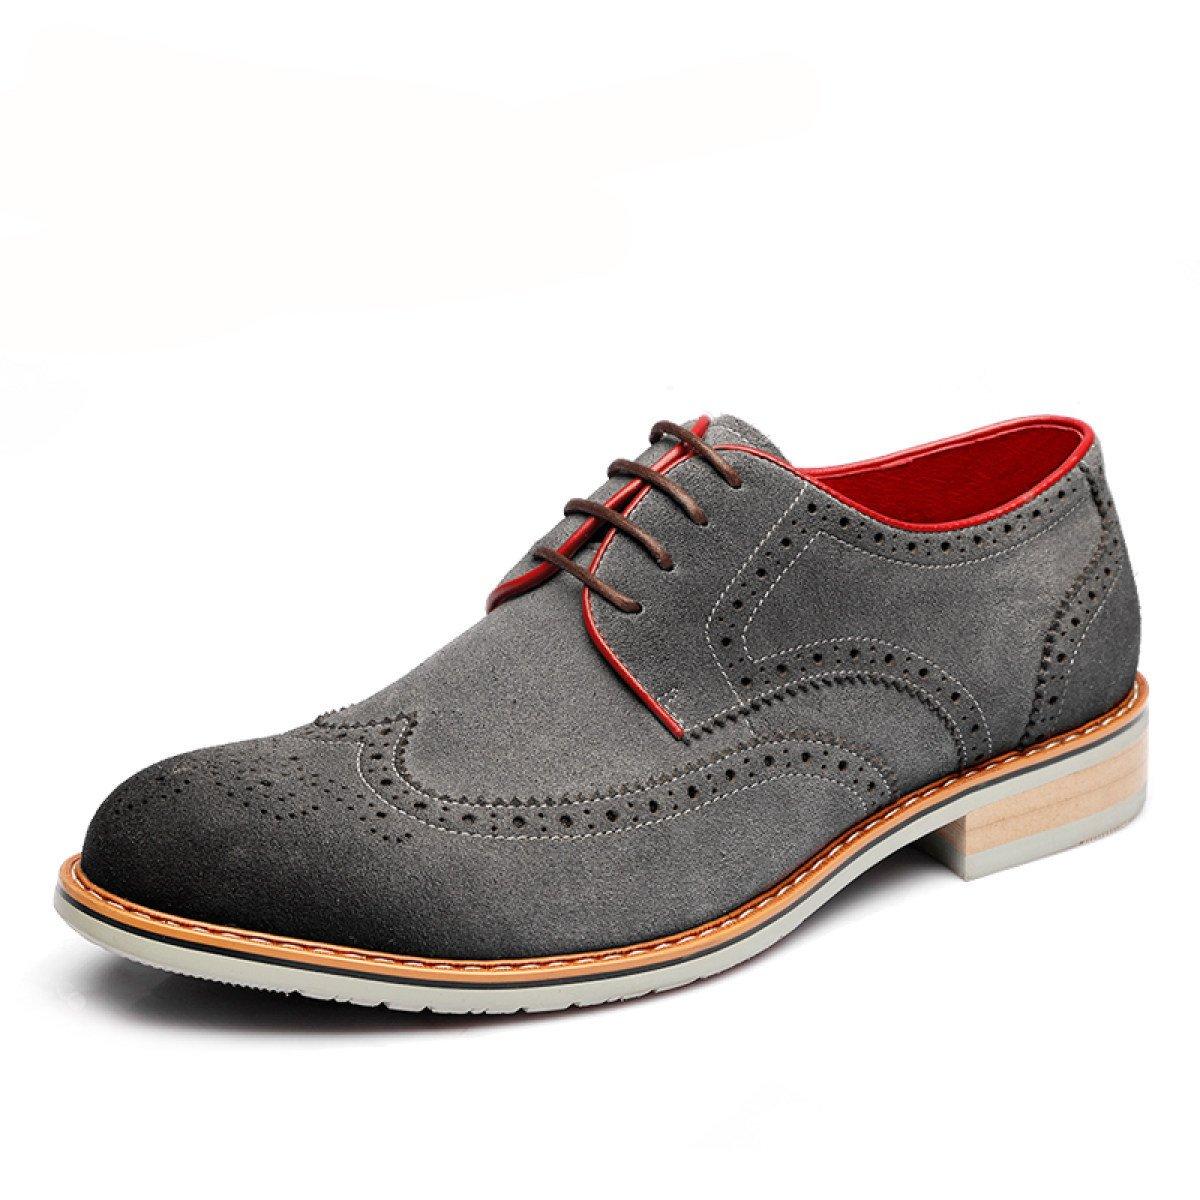 GRRONG Herren Brock Geschnitzt Tauml;gliche Beilauml;ufige Schuhe Trend-Schuhe  43|Grey